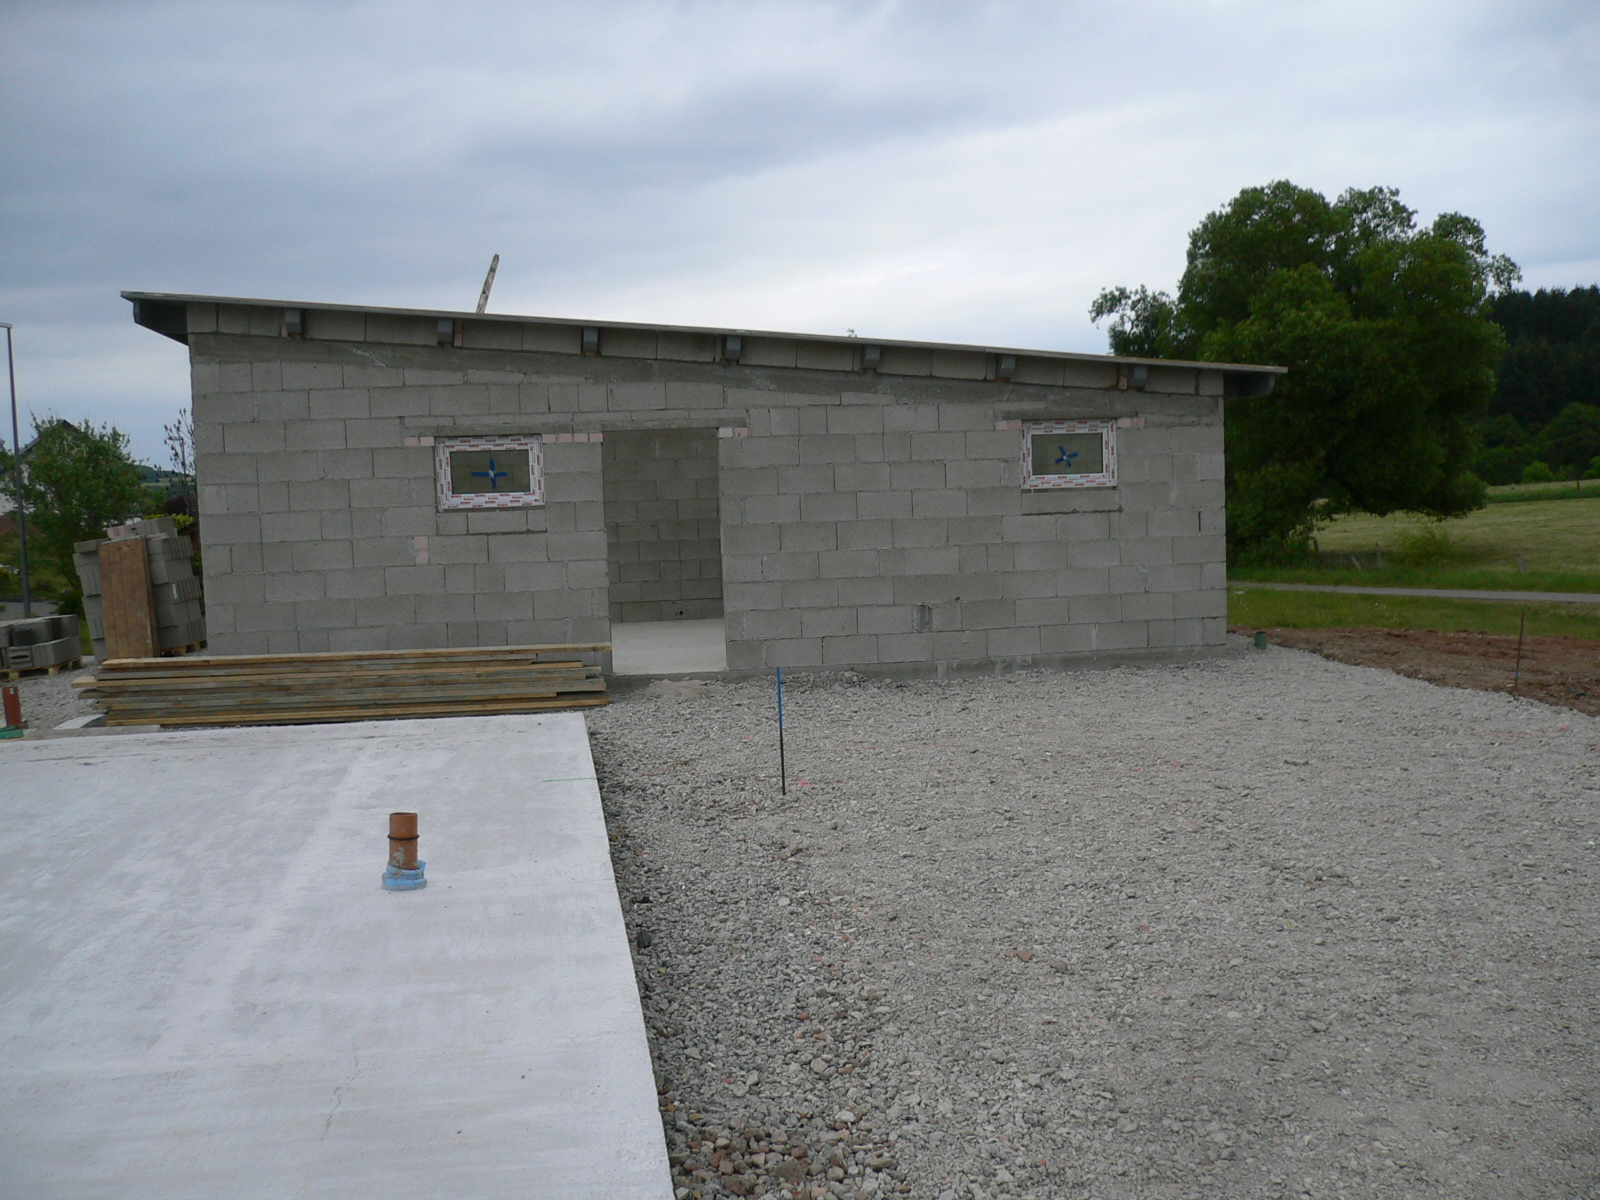 danwood haus park 128p bei idar oberstein mai 2011. Black Bedroom Furniture Sets. Home Design Ideas